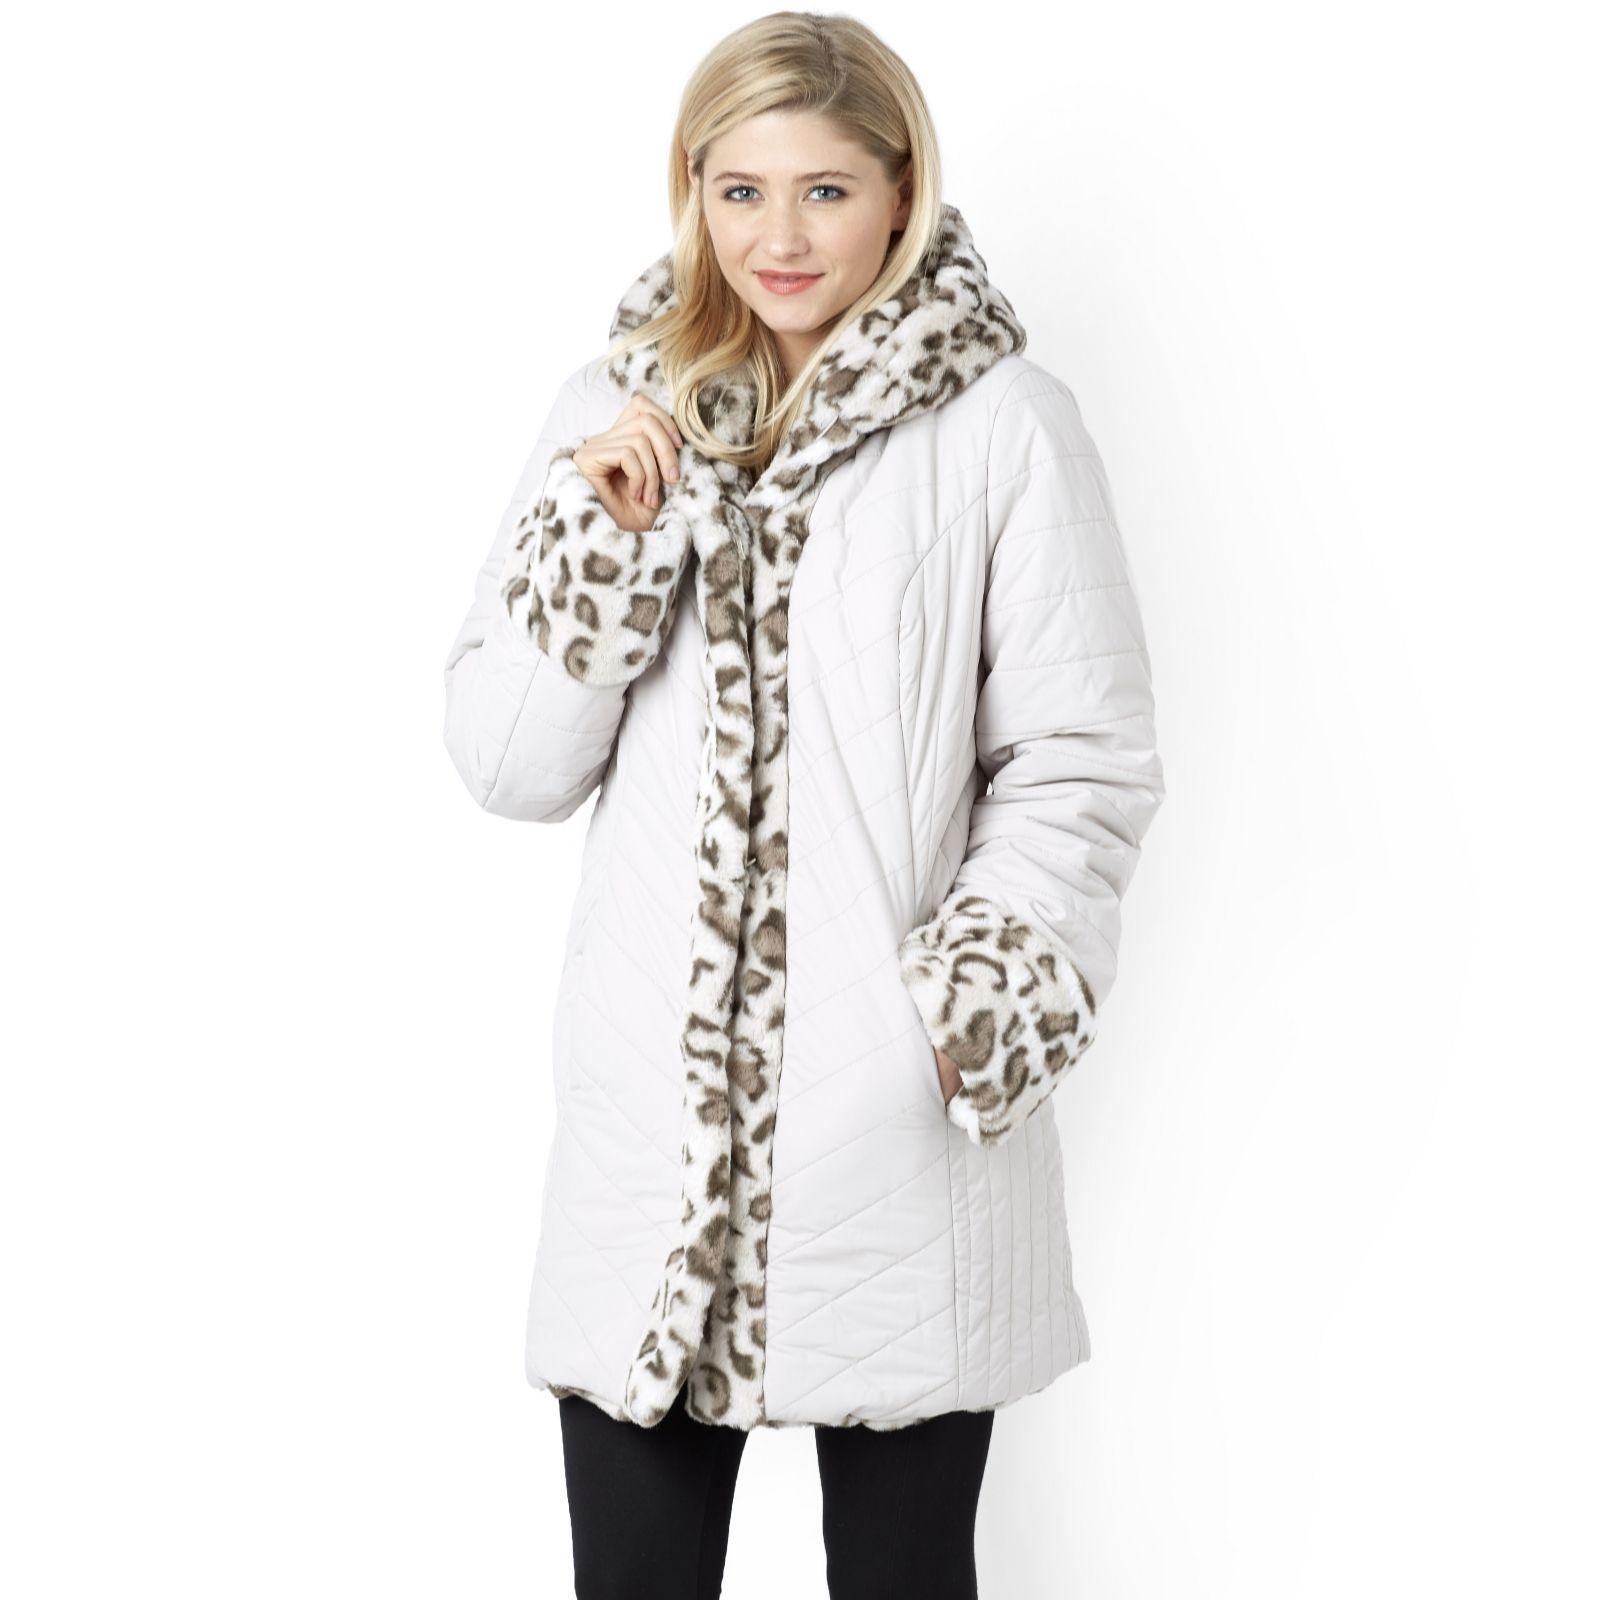 0cfdd8cb2f843 Dennis Basso Reversible Faux Fur Hooded Puffer Coat - Page 1 - QVC UK